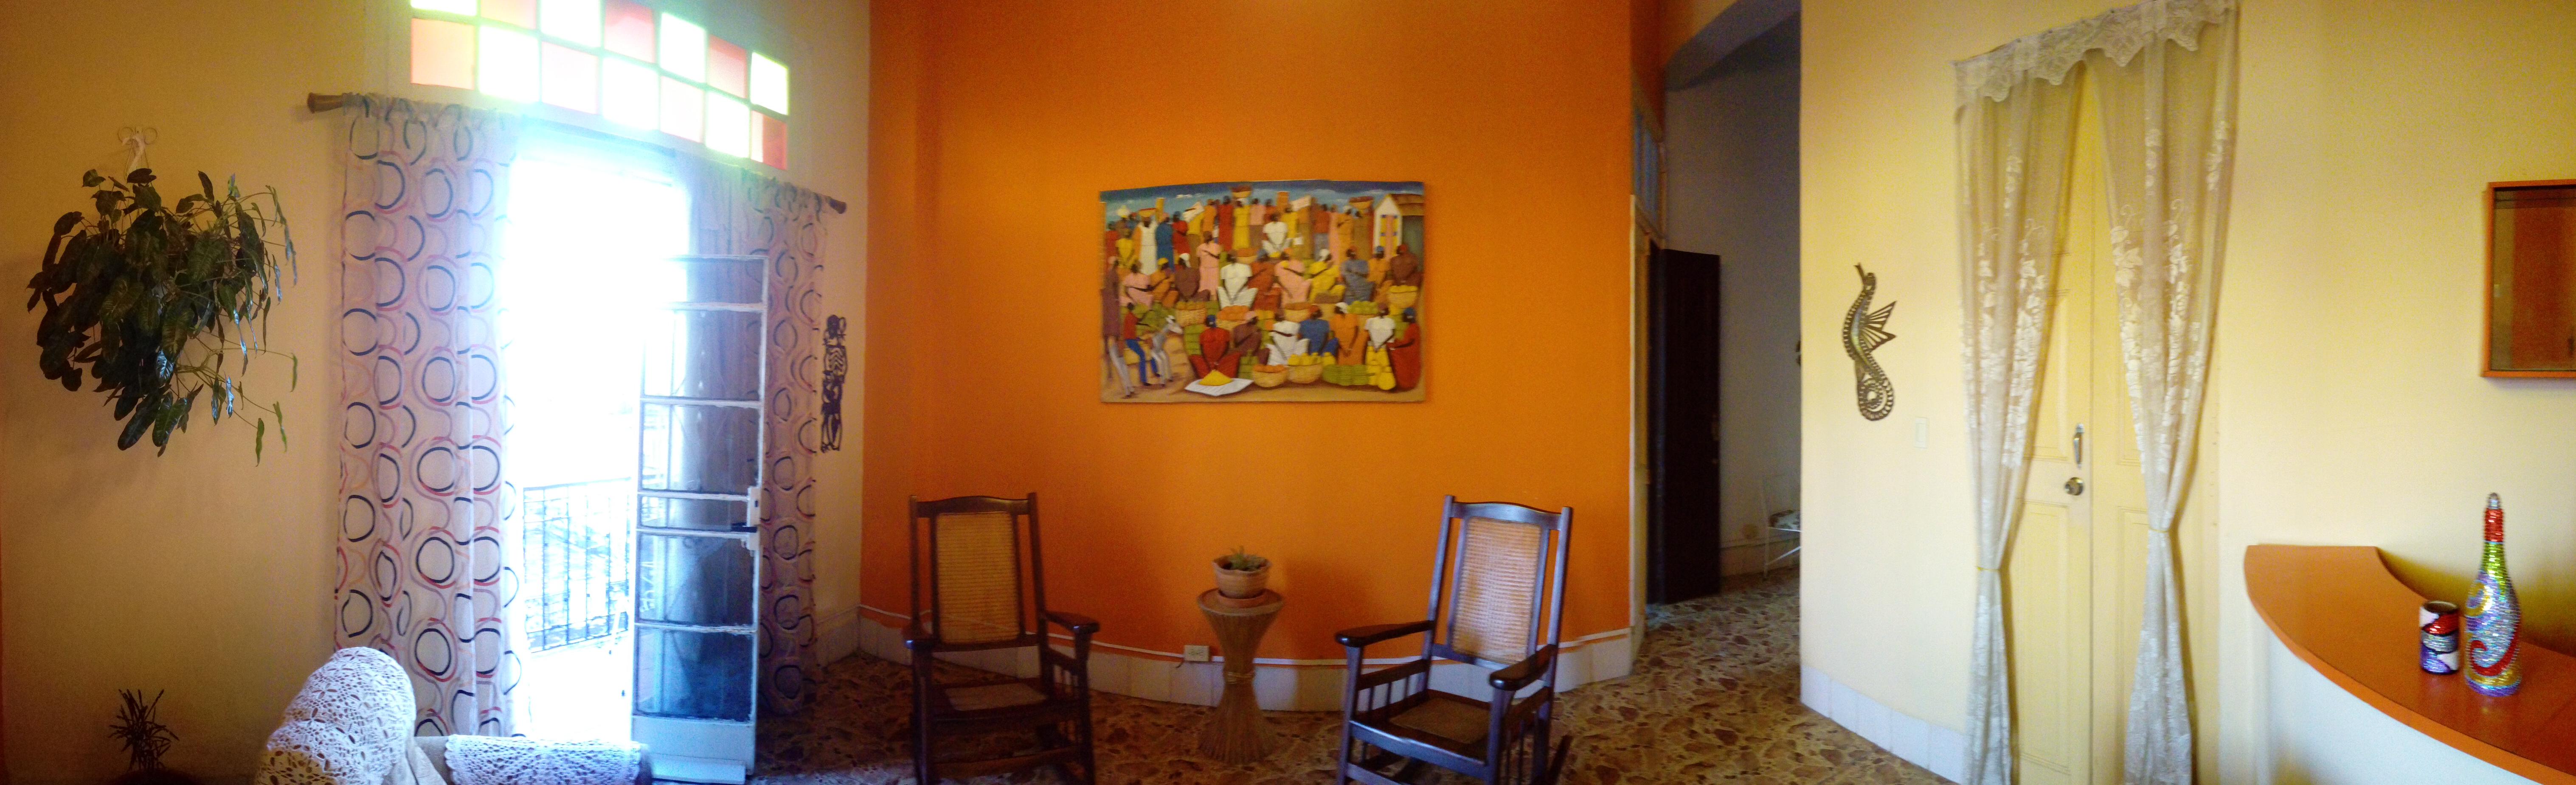 The Buena Vista casa particular show in Havana, Cuba